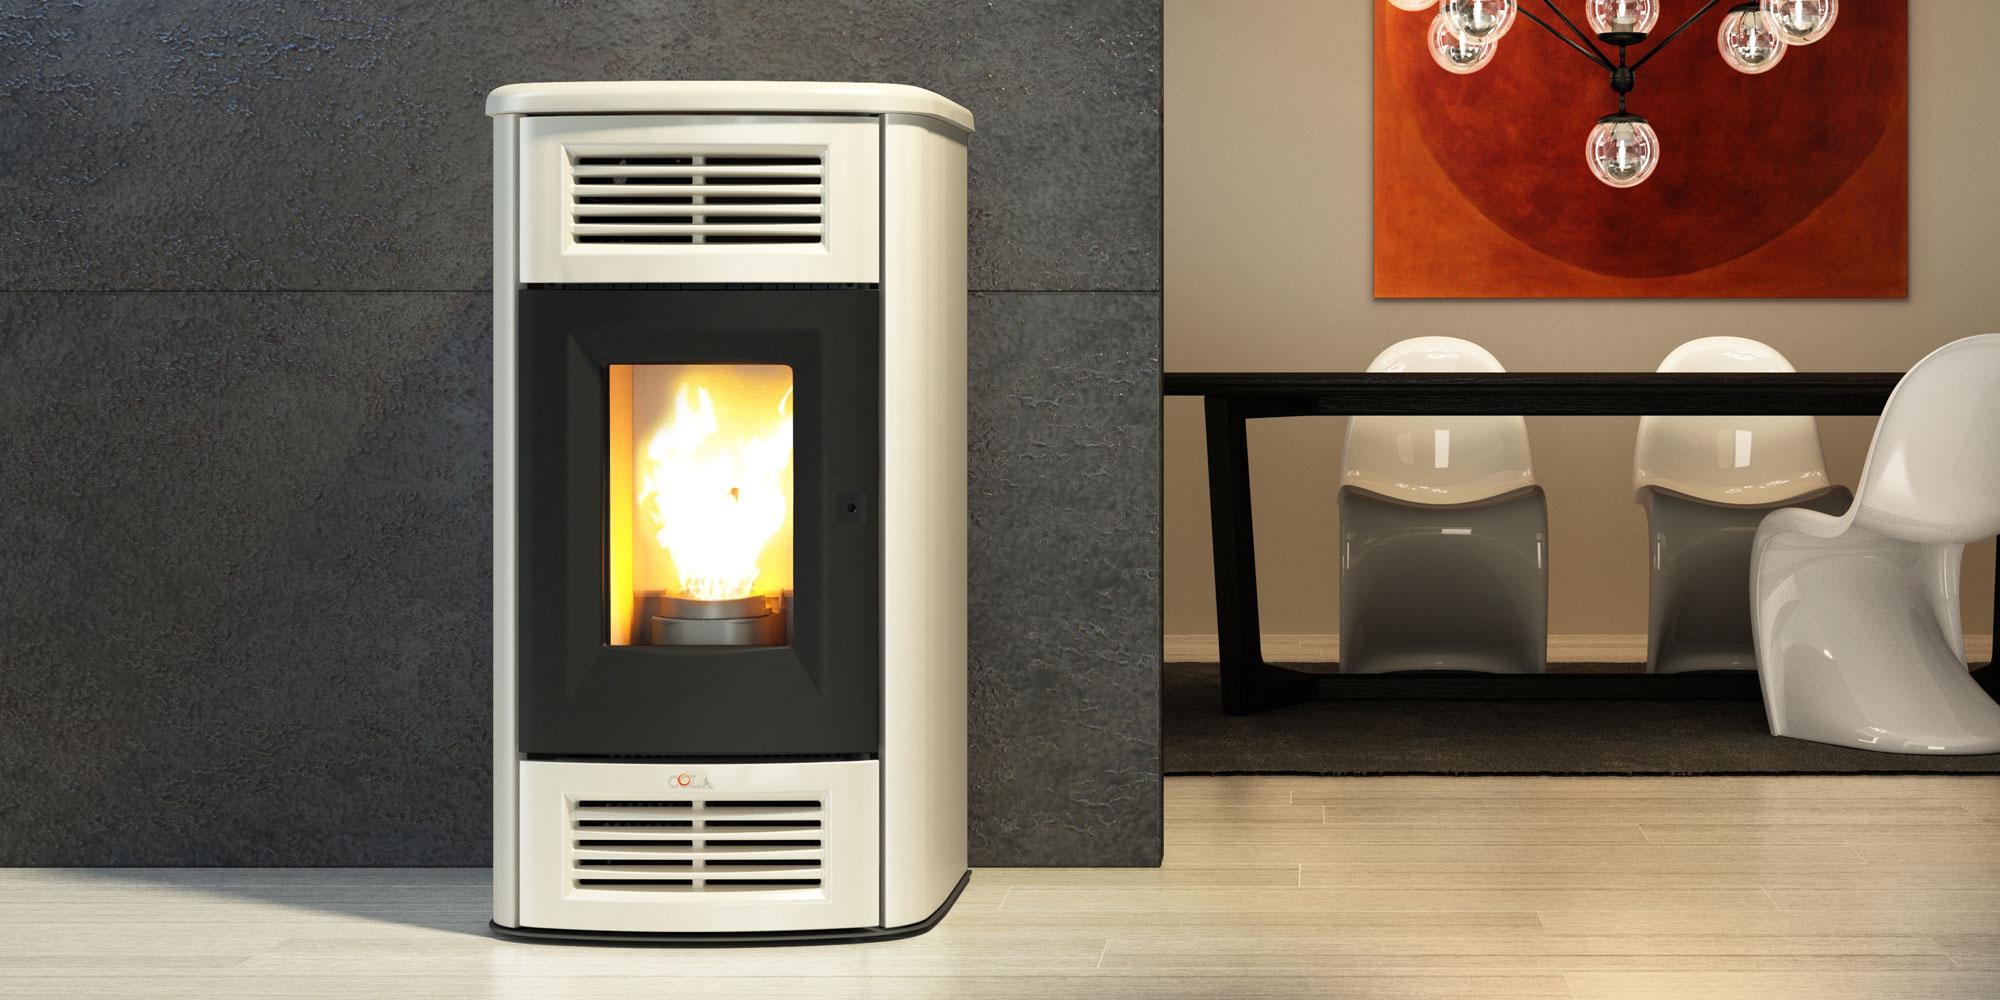 po le granul s anselmo cola beauty 13 flammes du monde. Black Bedroom Furniture Sets. Home Design Ideas